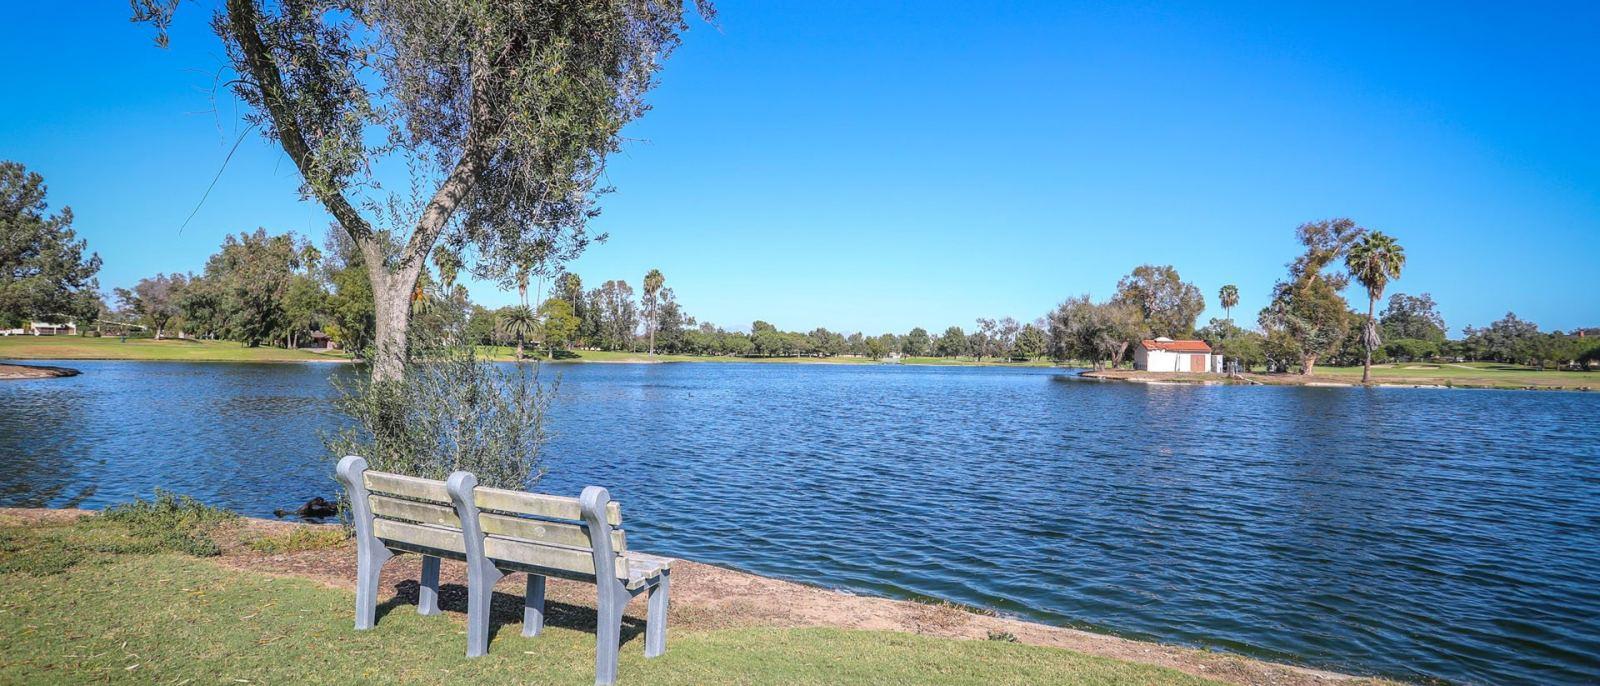 Lakewood Golf Course lake